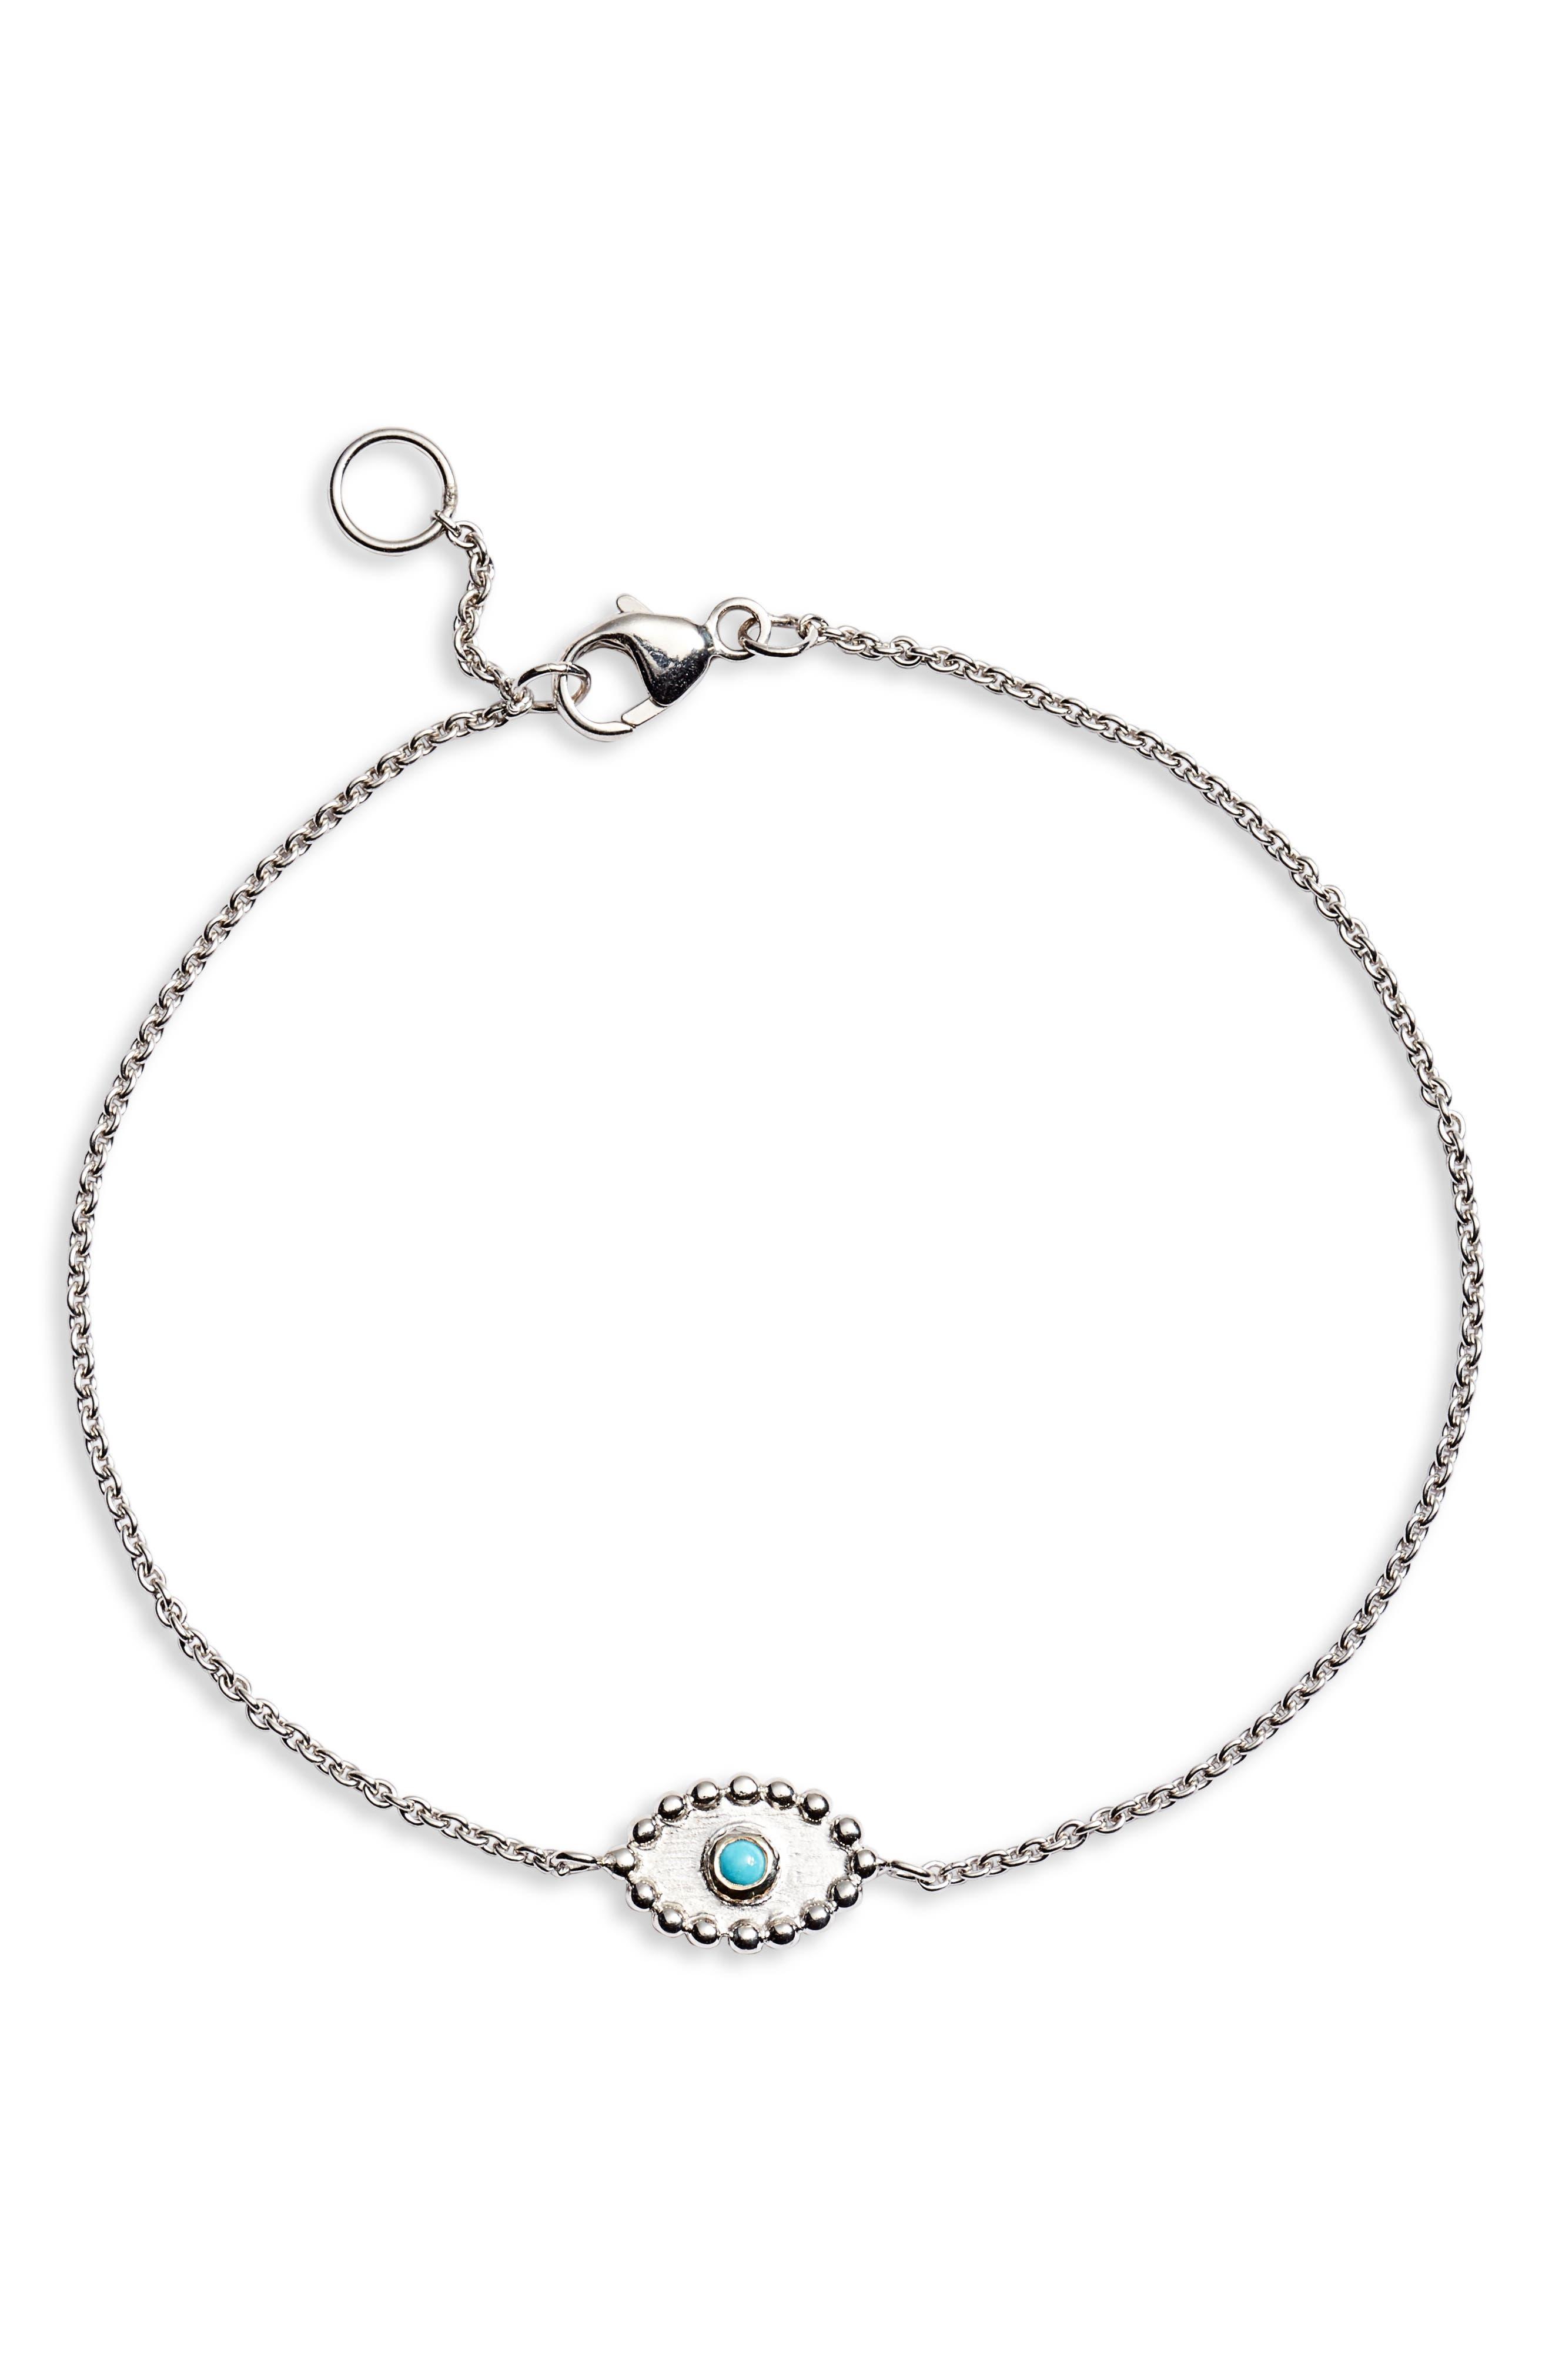 Dew Drop Turquoise Evil Eye Bracelet